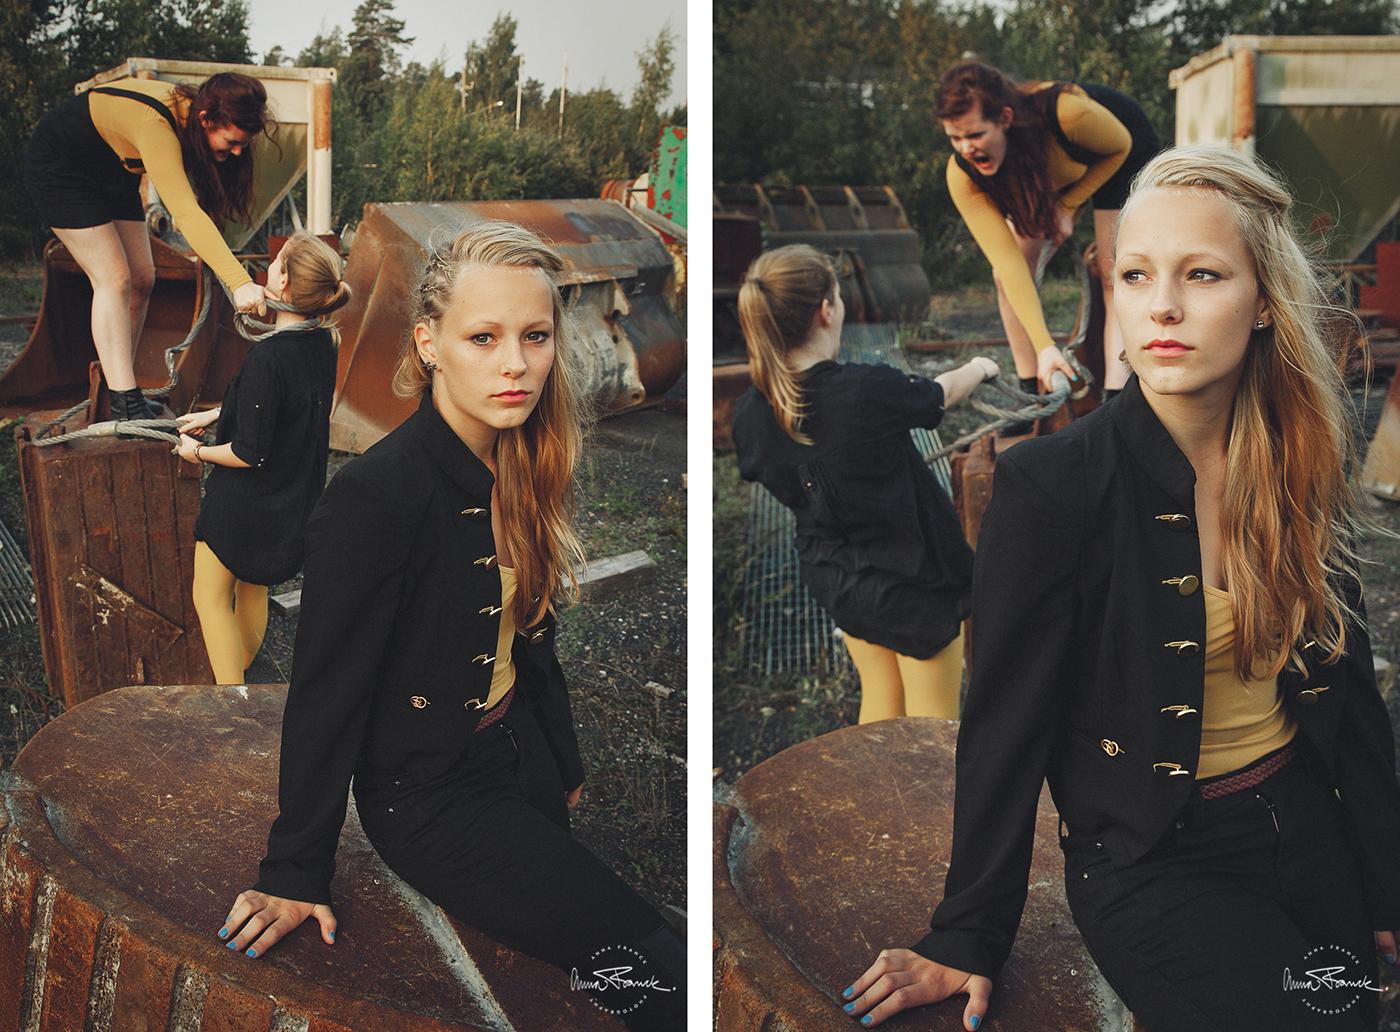 sisters, systrar, syskonbild, perhekuva, family, portrait, porträtt, fotografering, pargas, parainen, finland, suomi, anna, franck, retro, sunrise, soluppgång, auringonnousu, cool, tuff, skrotupplag, rust, rost, ruoste, stockholm, fotograf